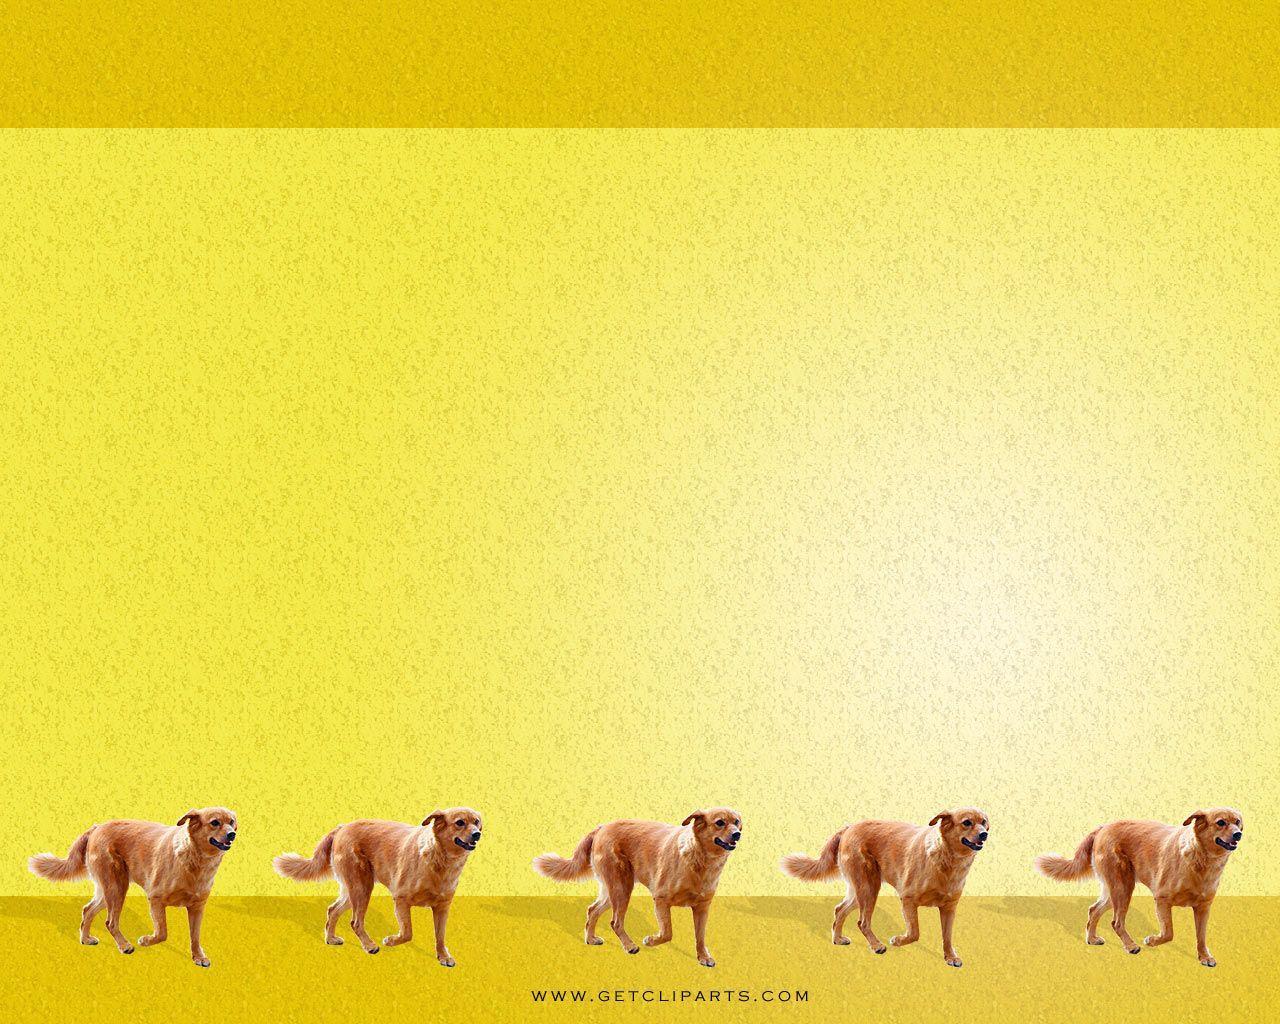 Dog Backgrounds Image - Wallpaper Cave